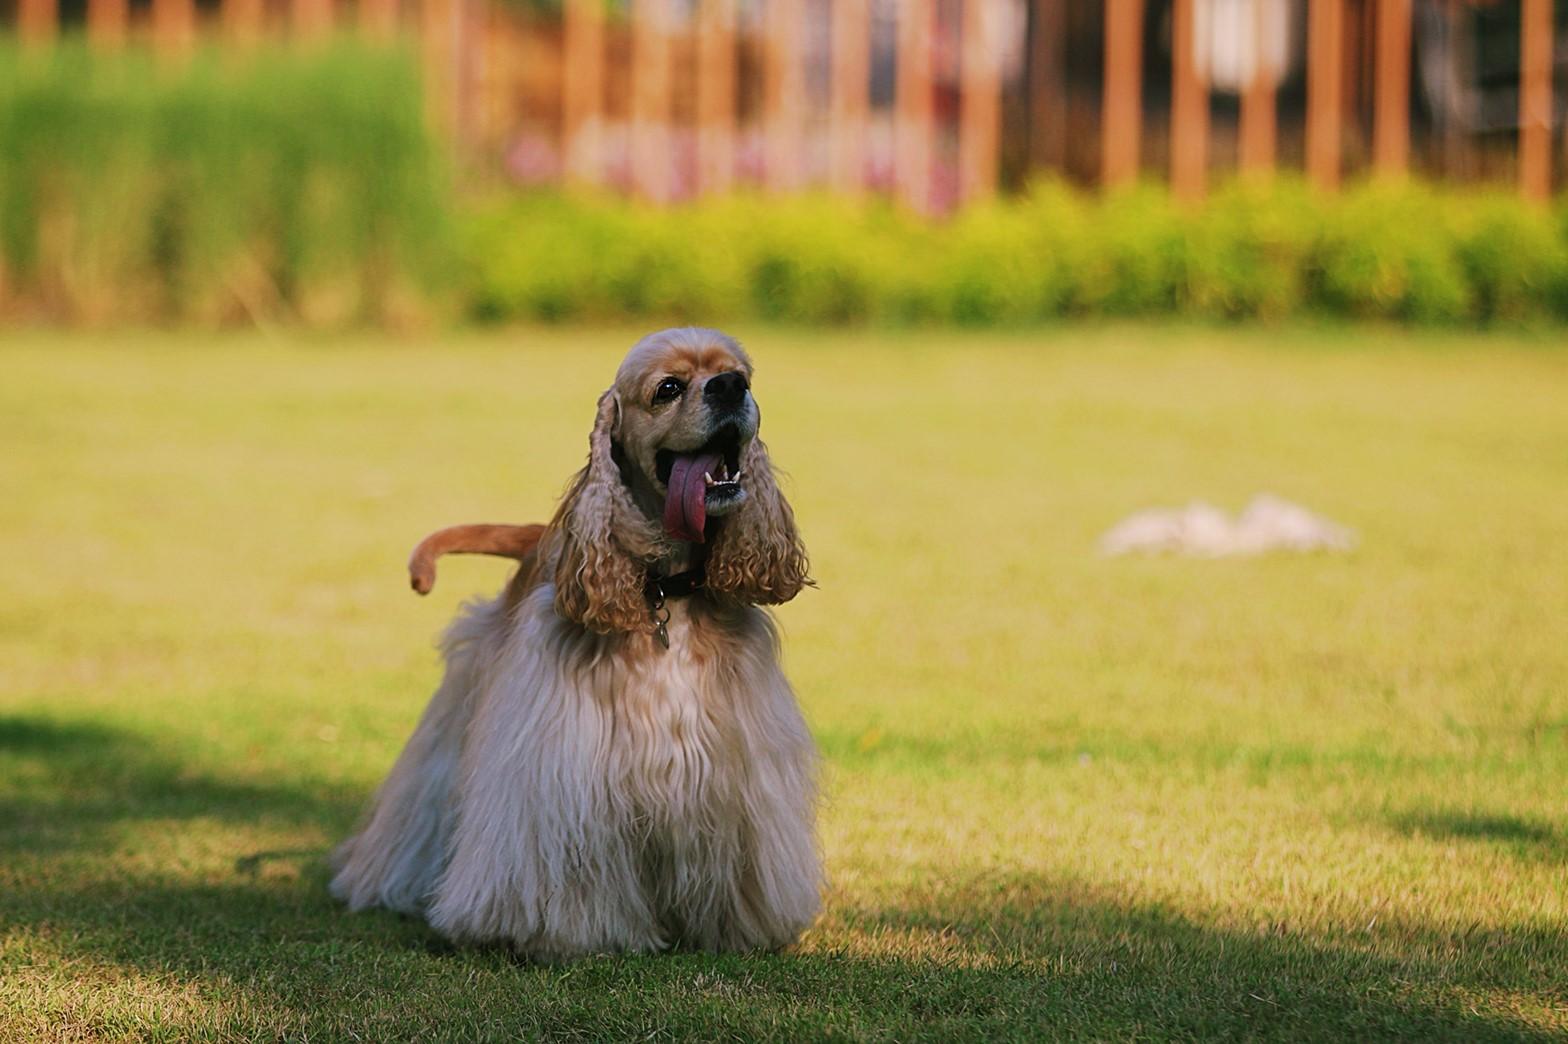 TRAIL and TAIL Pet-Friendly Community แหล่งแฮงค์เอ้าท์ใหม่ของคนเมือง พร้อมเติมความสุขให้สัตว์เลี้ยงแสนรักได้ทุกวัน 18 -